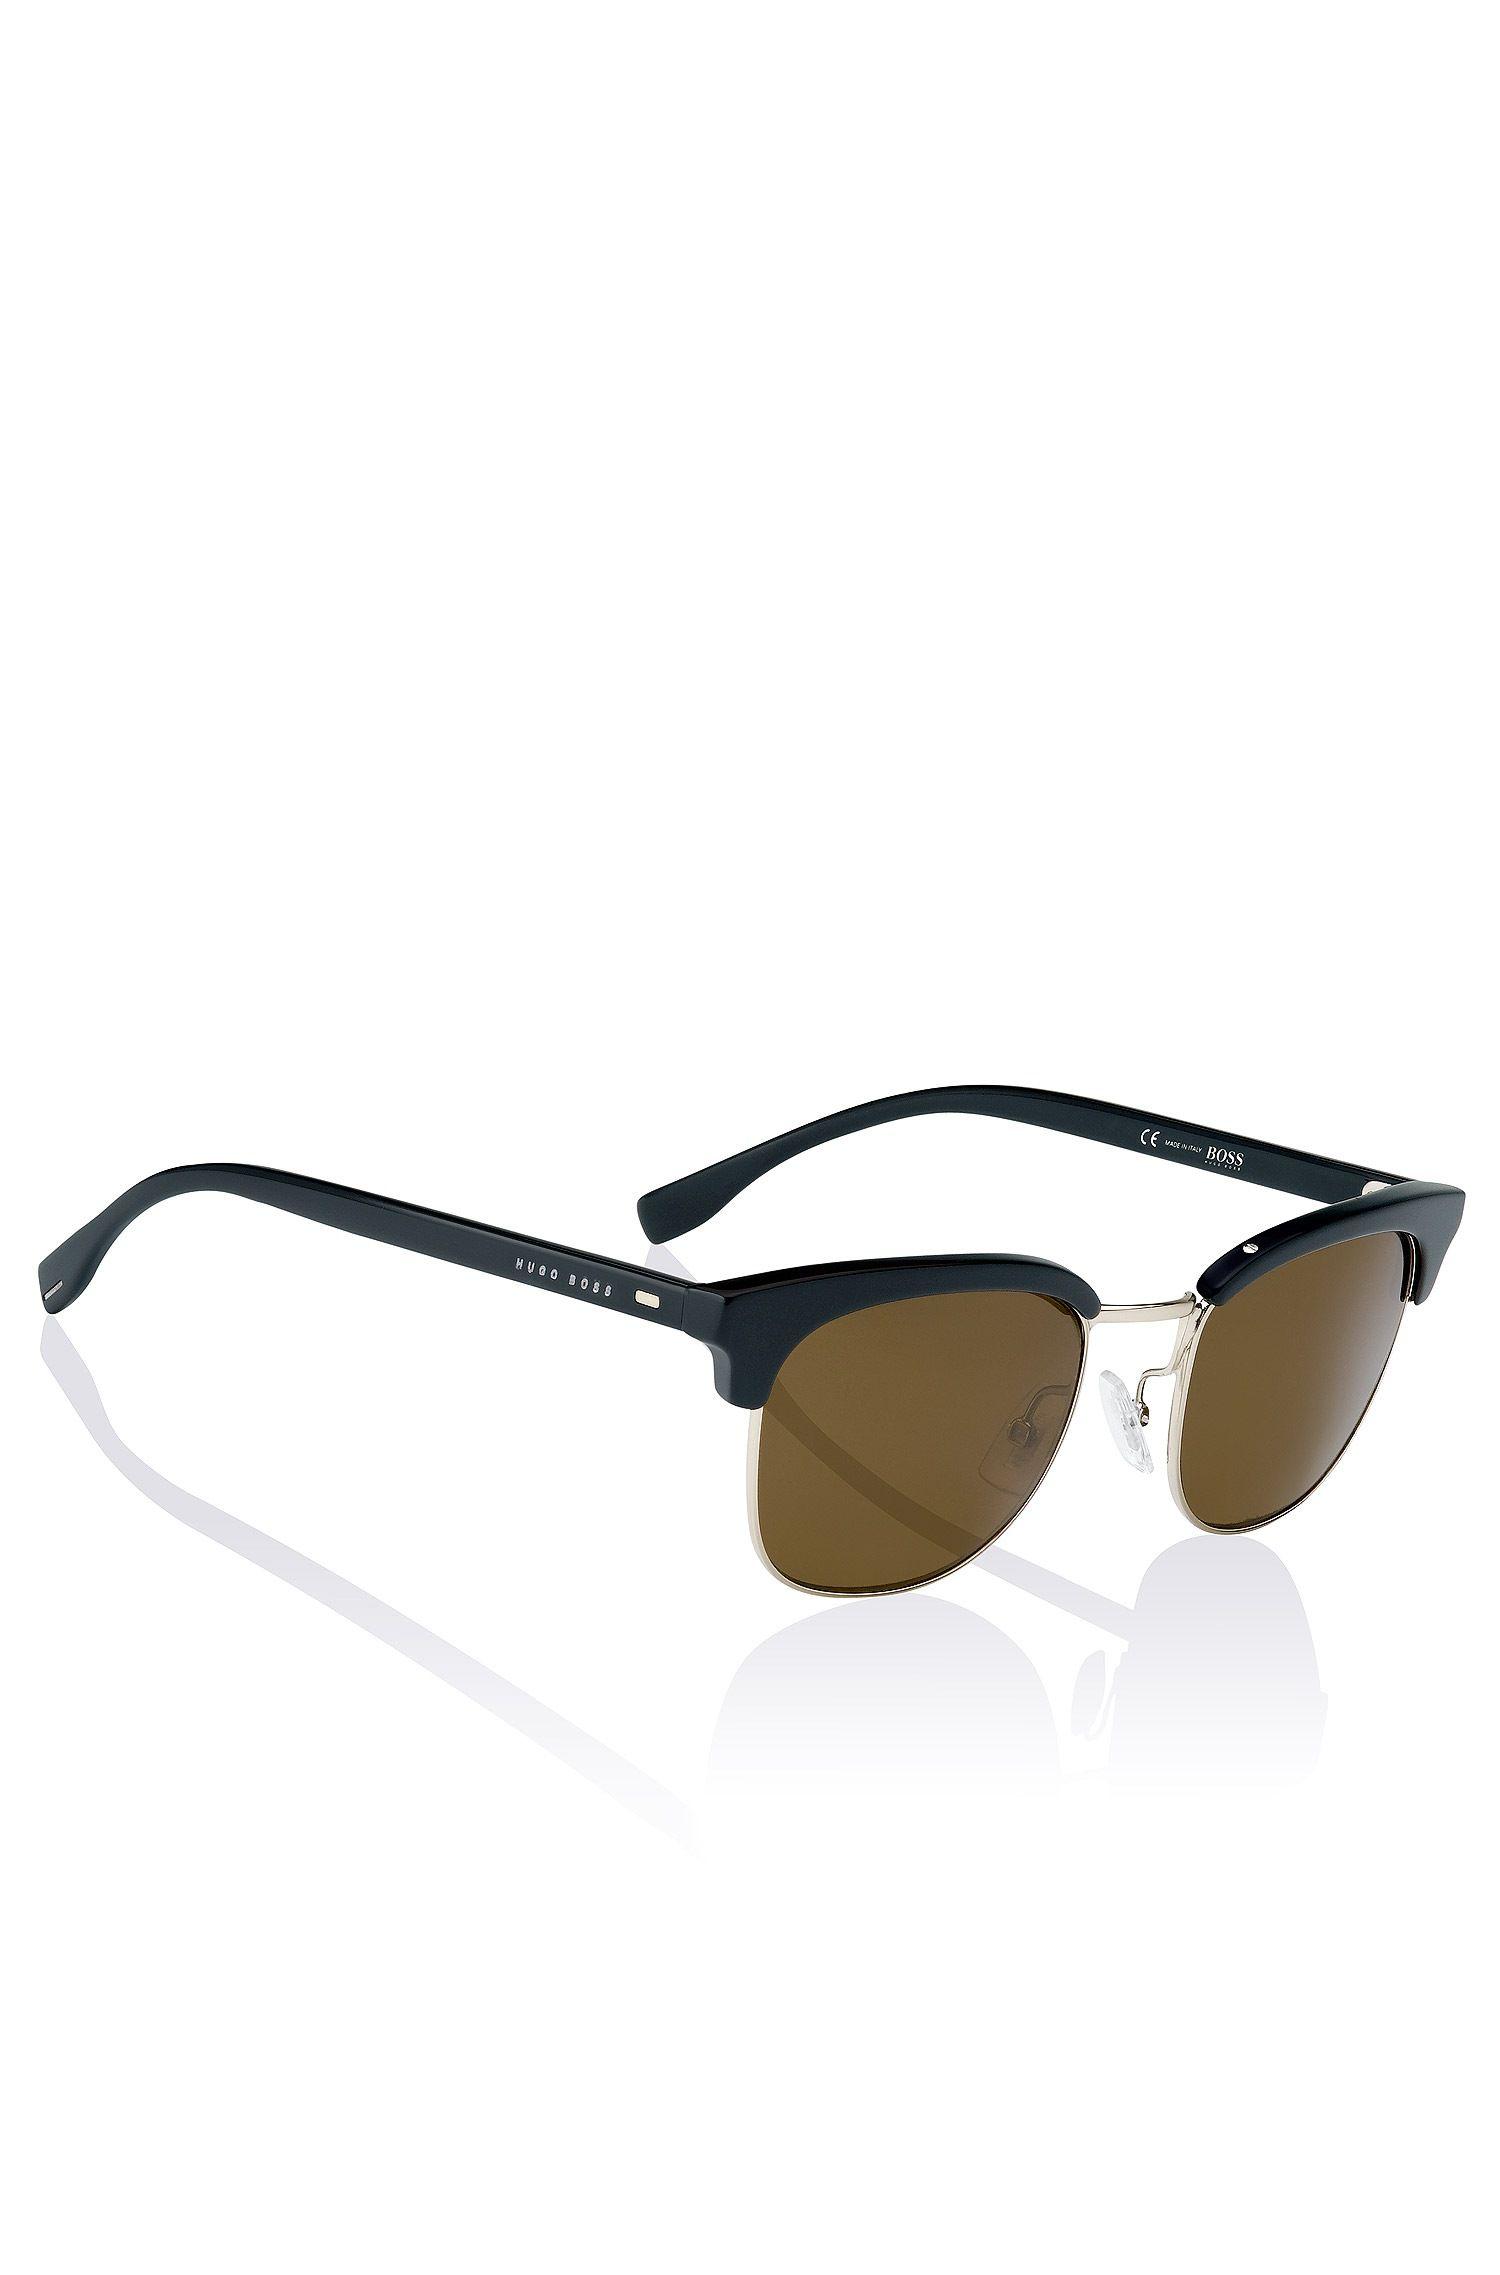 Clubmaster-zonnebril 'BOSS 0667'